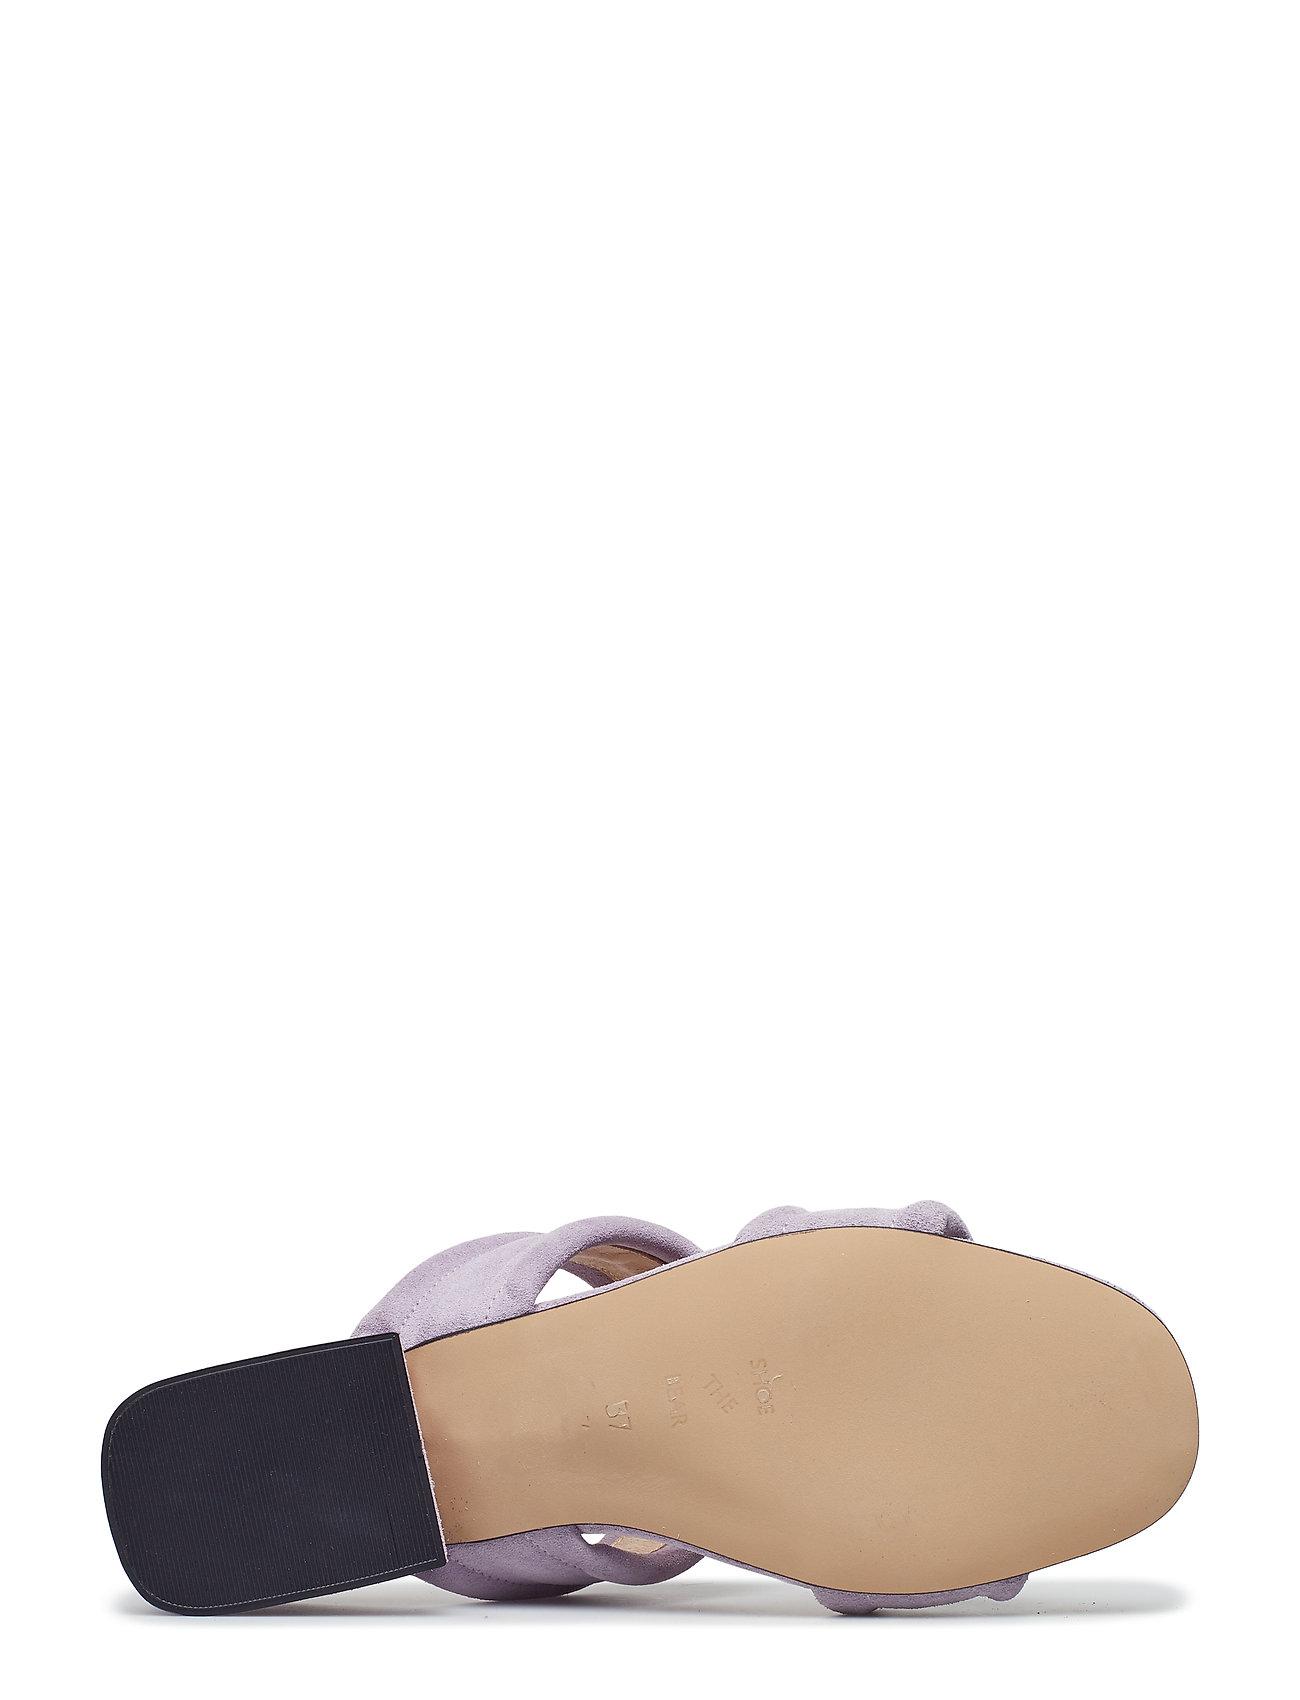 Shoe The Bear YASMIN SLIDE S - Absatzschuhe LILAC - Schuhe Billige